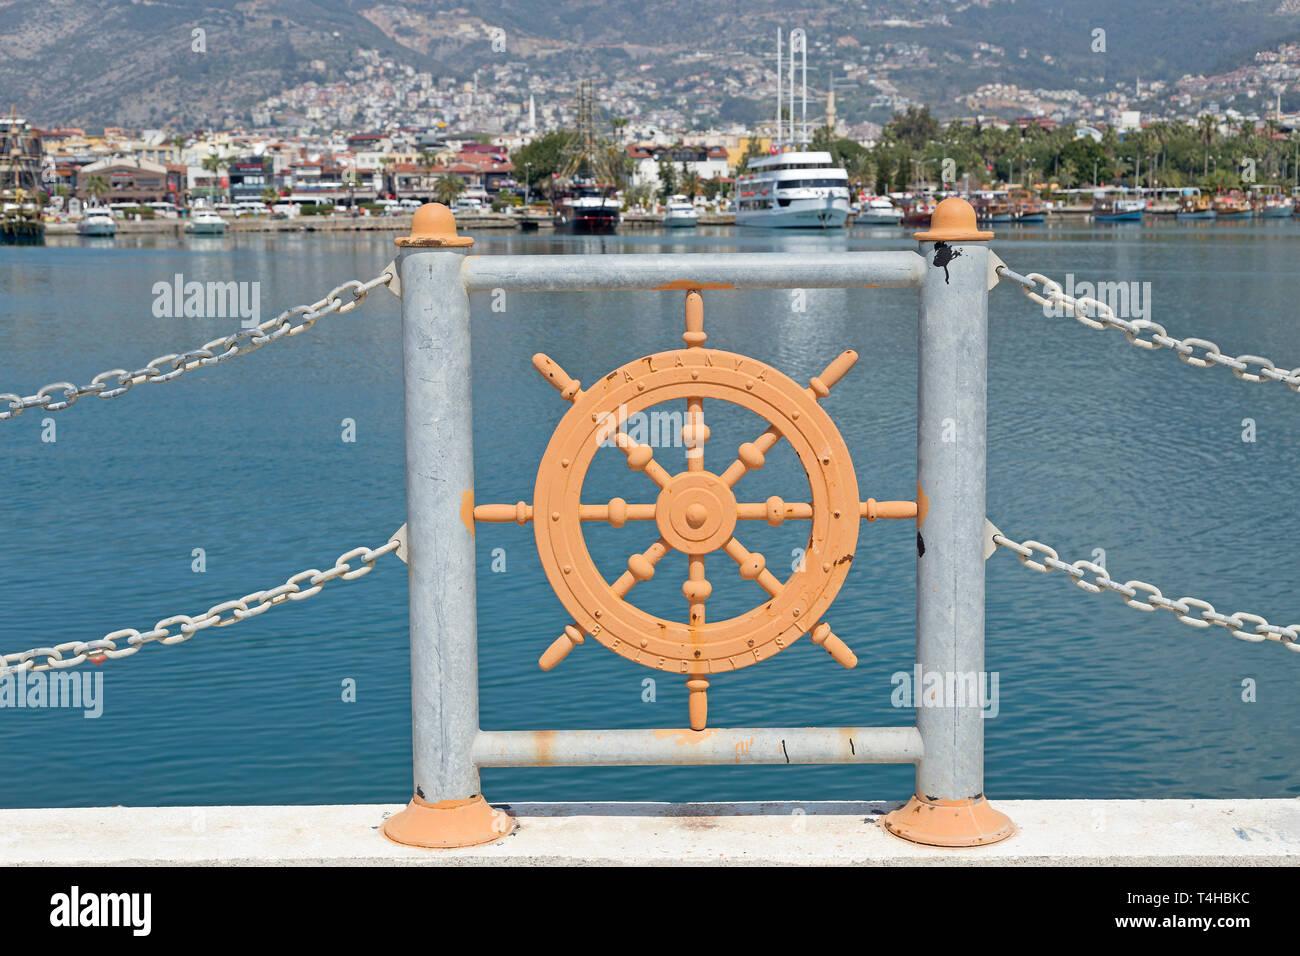 harbour, Alanya, Turkey - Stock Image